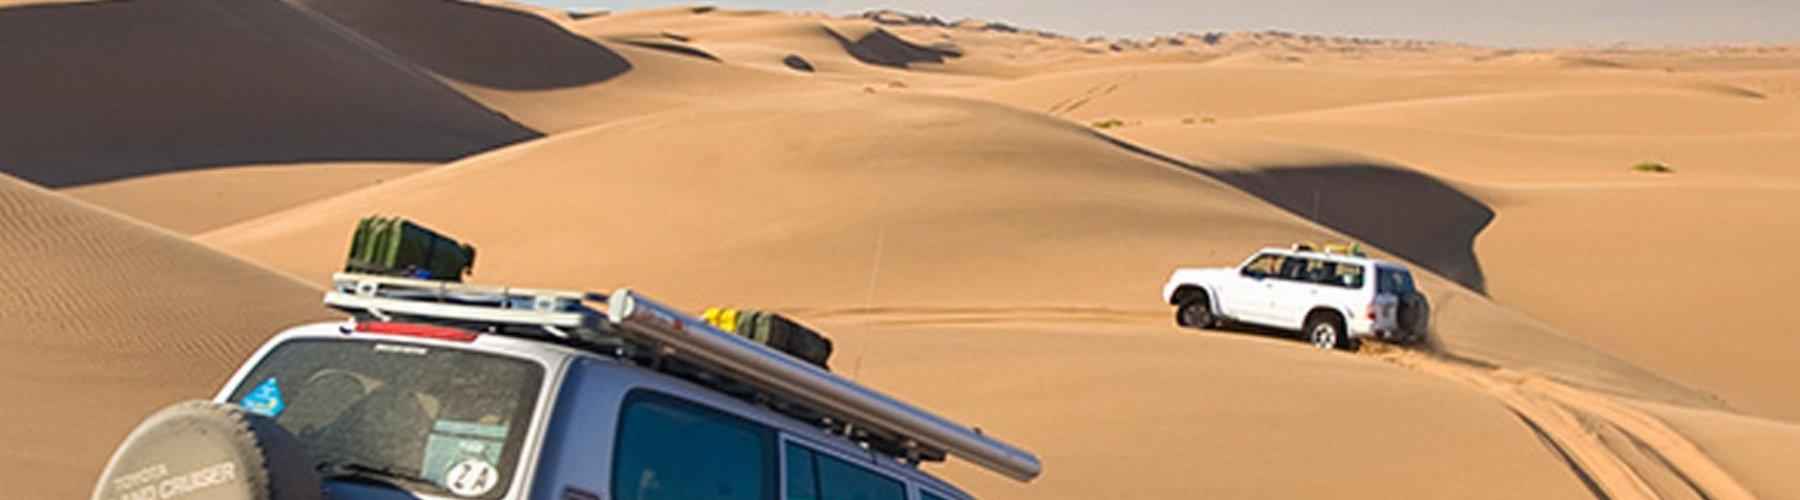 Viaggi in self drive in Africa: informazioni, idee di viaggi